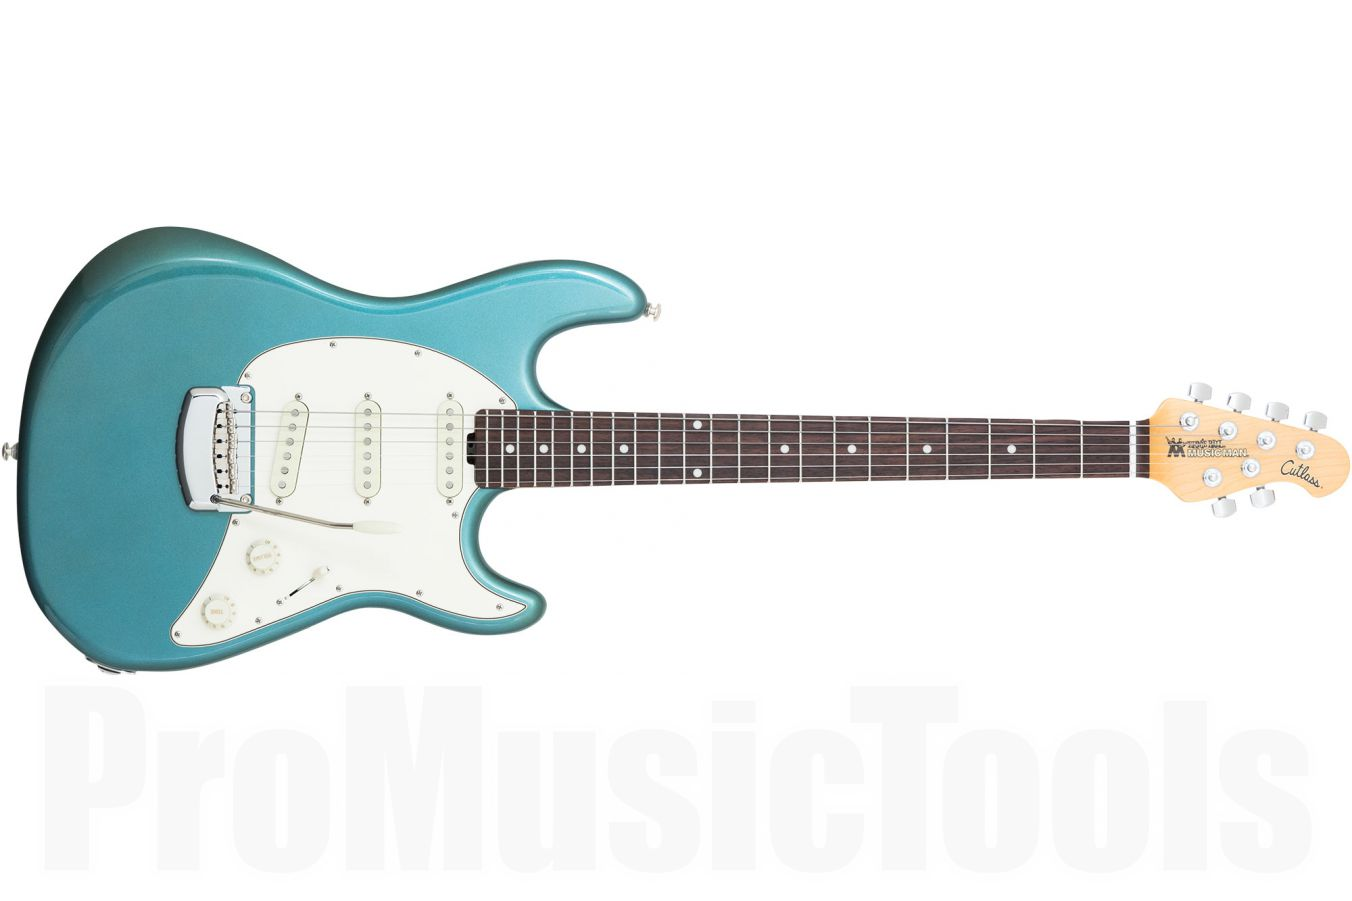 Music Man USA Cutlass Guitar VT - Vintage Turquoise RW - b-stock